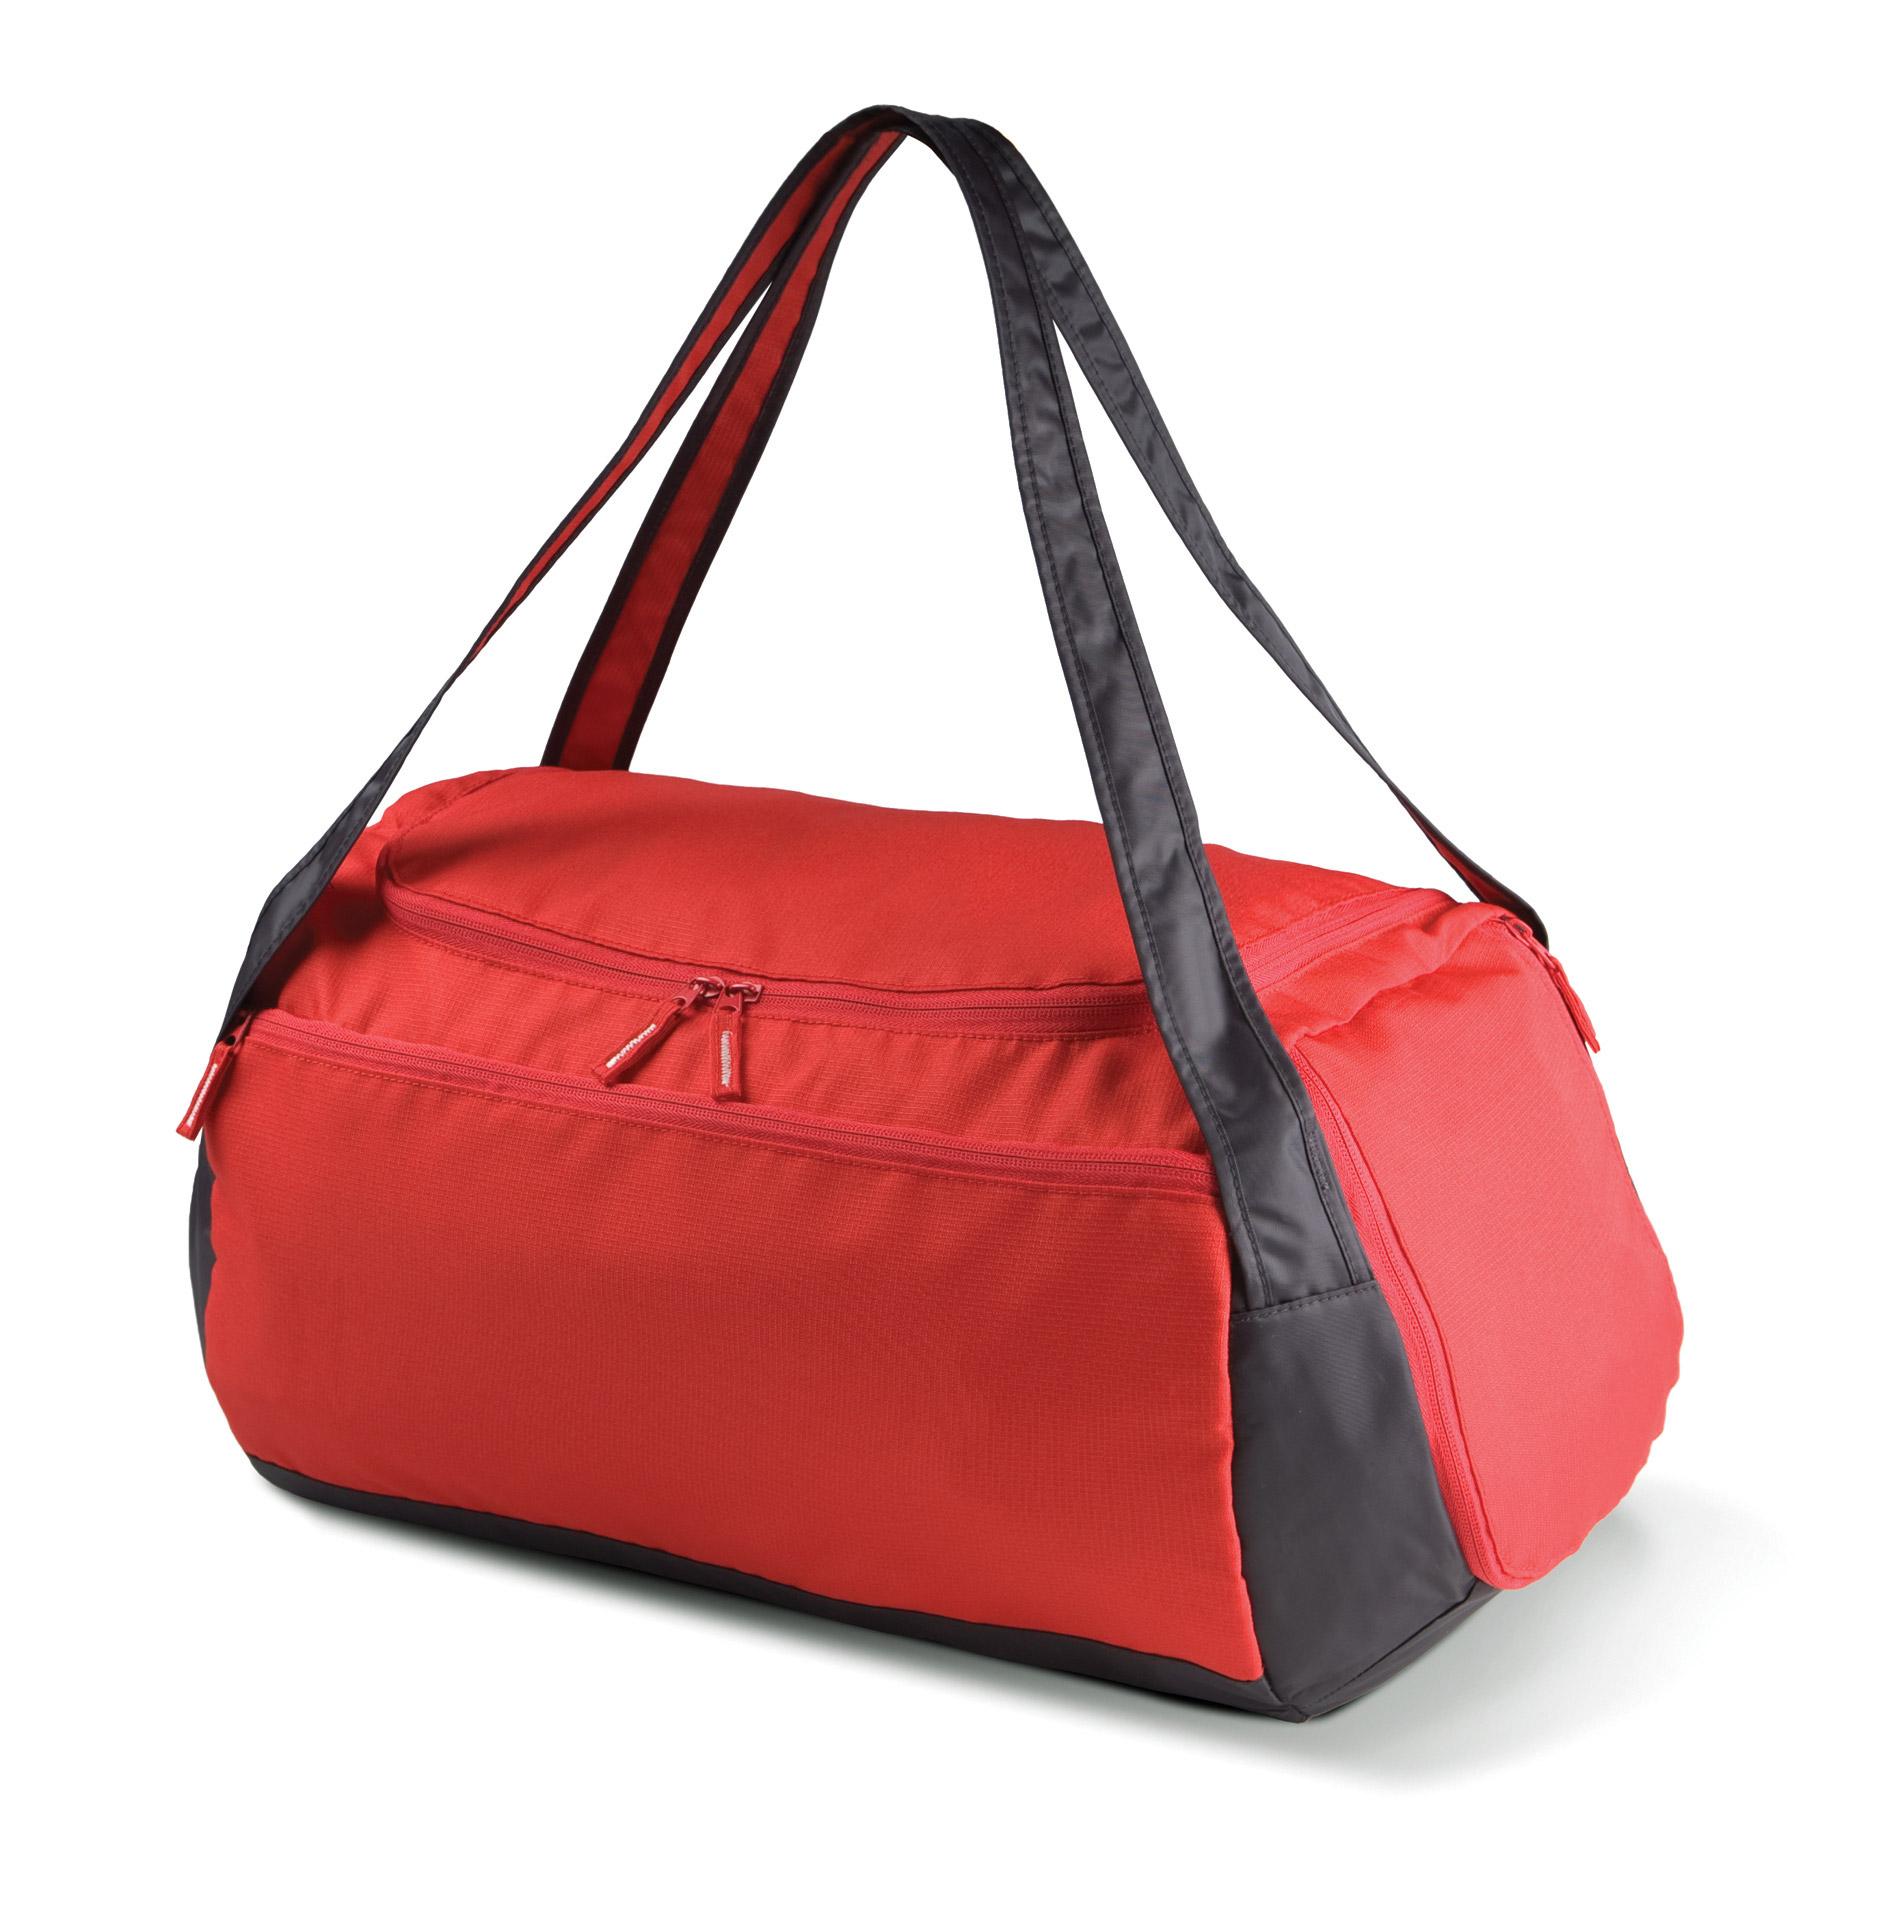 sporttas ki0602 rood / donkergrijs